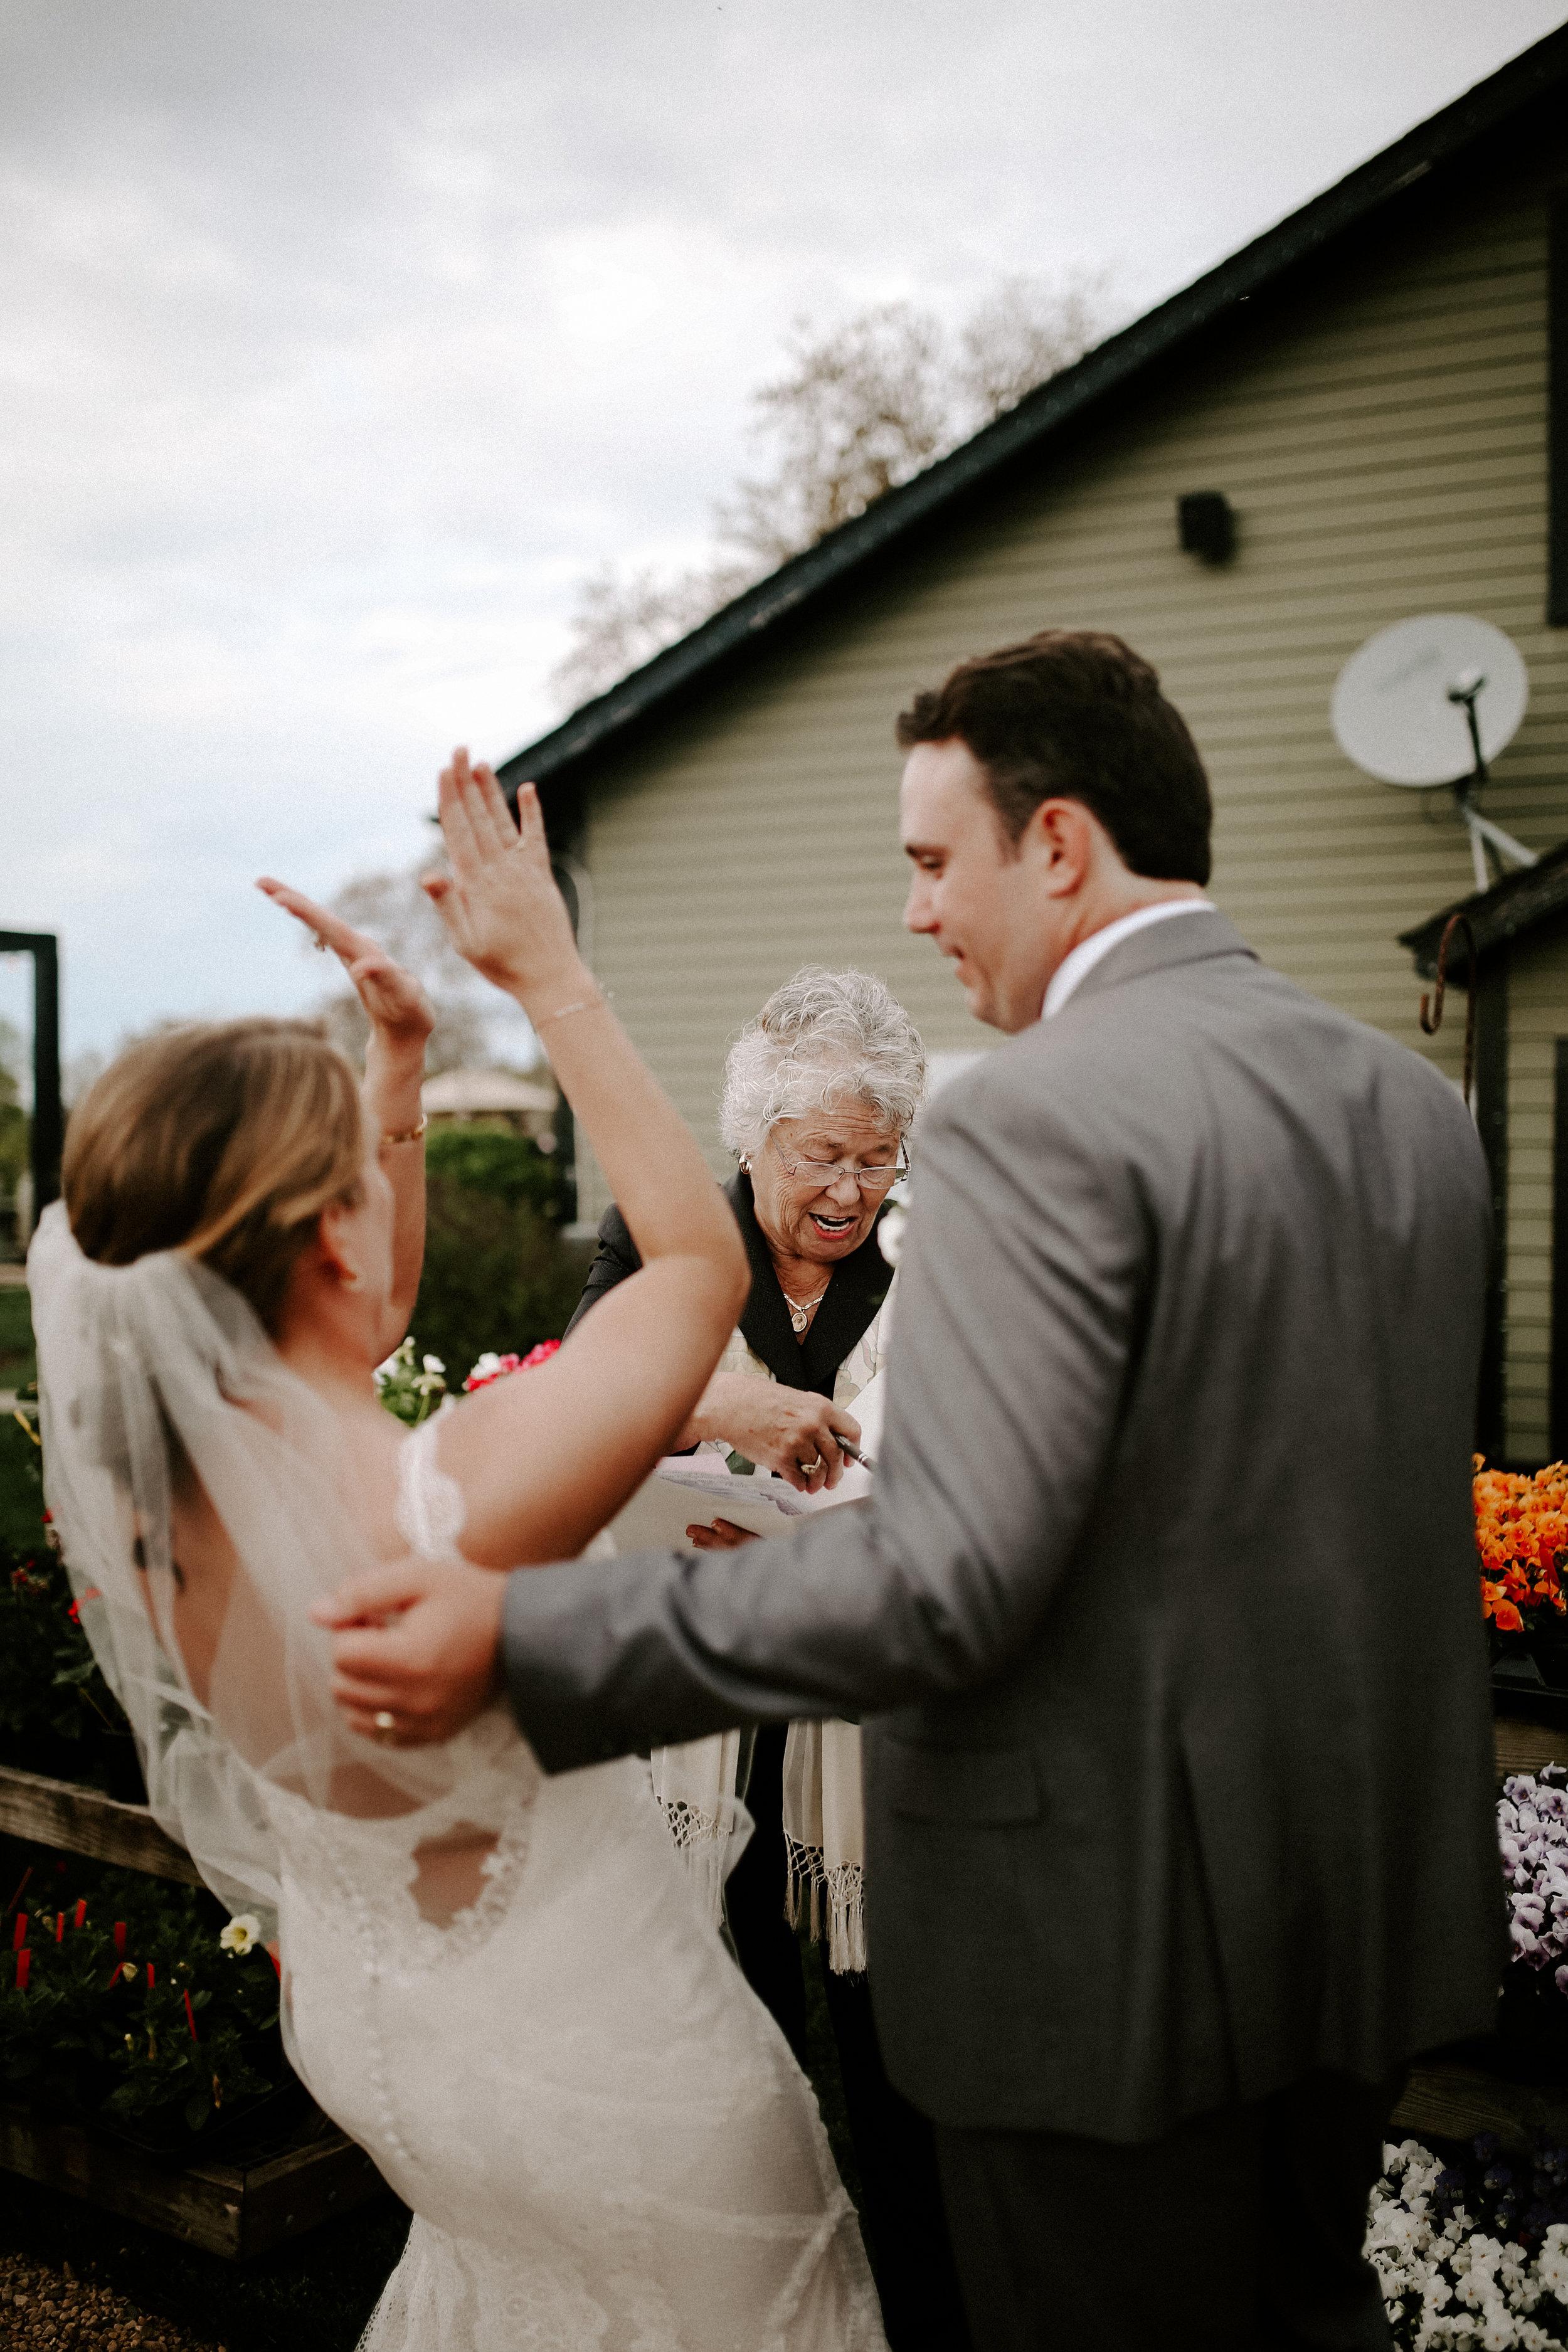 TheGreens_Married_2019-371.jpg